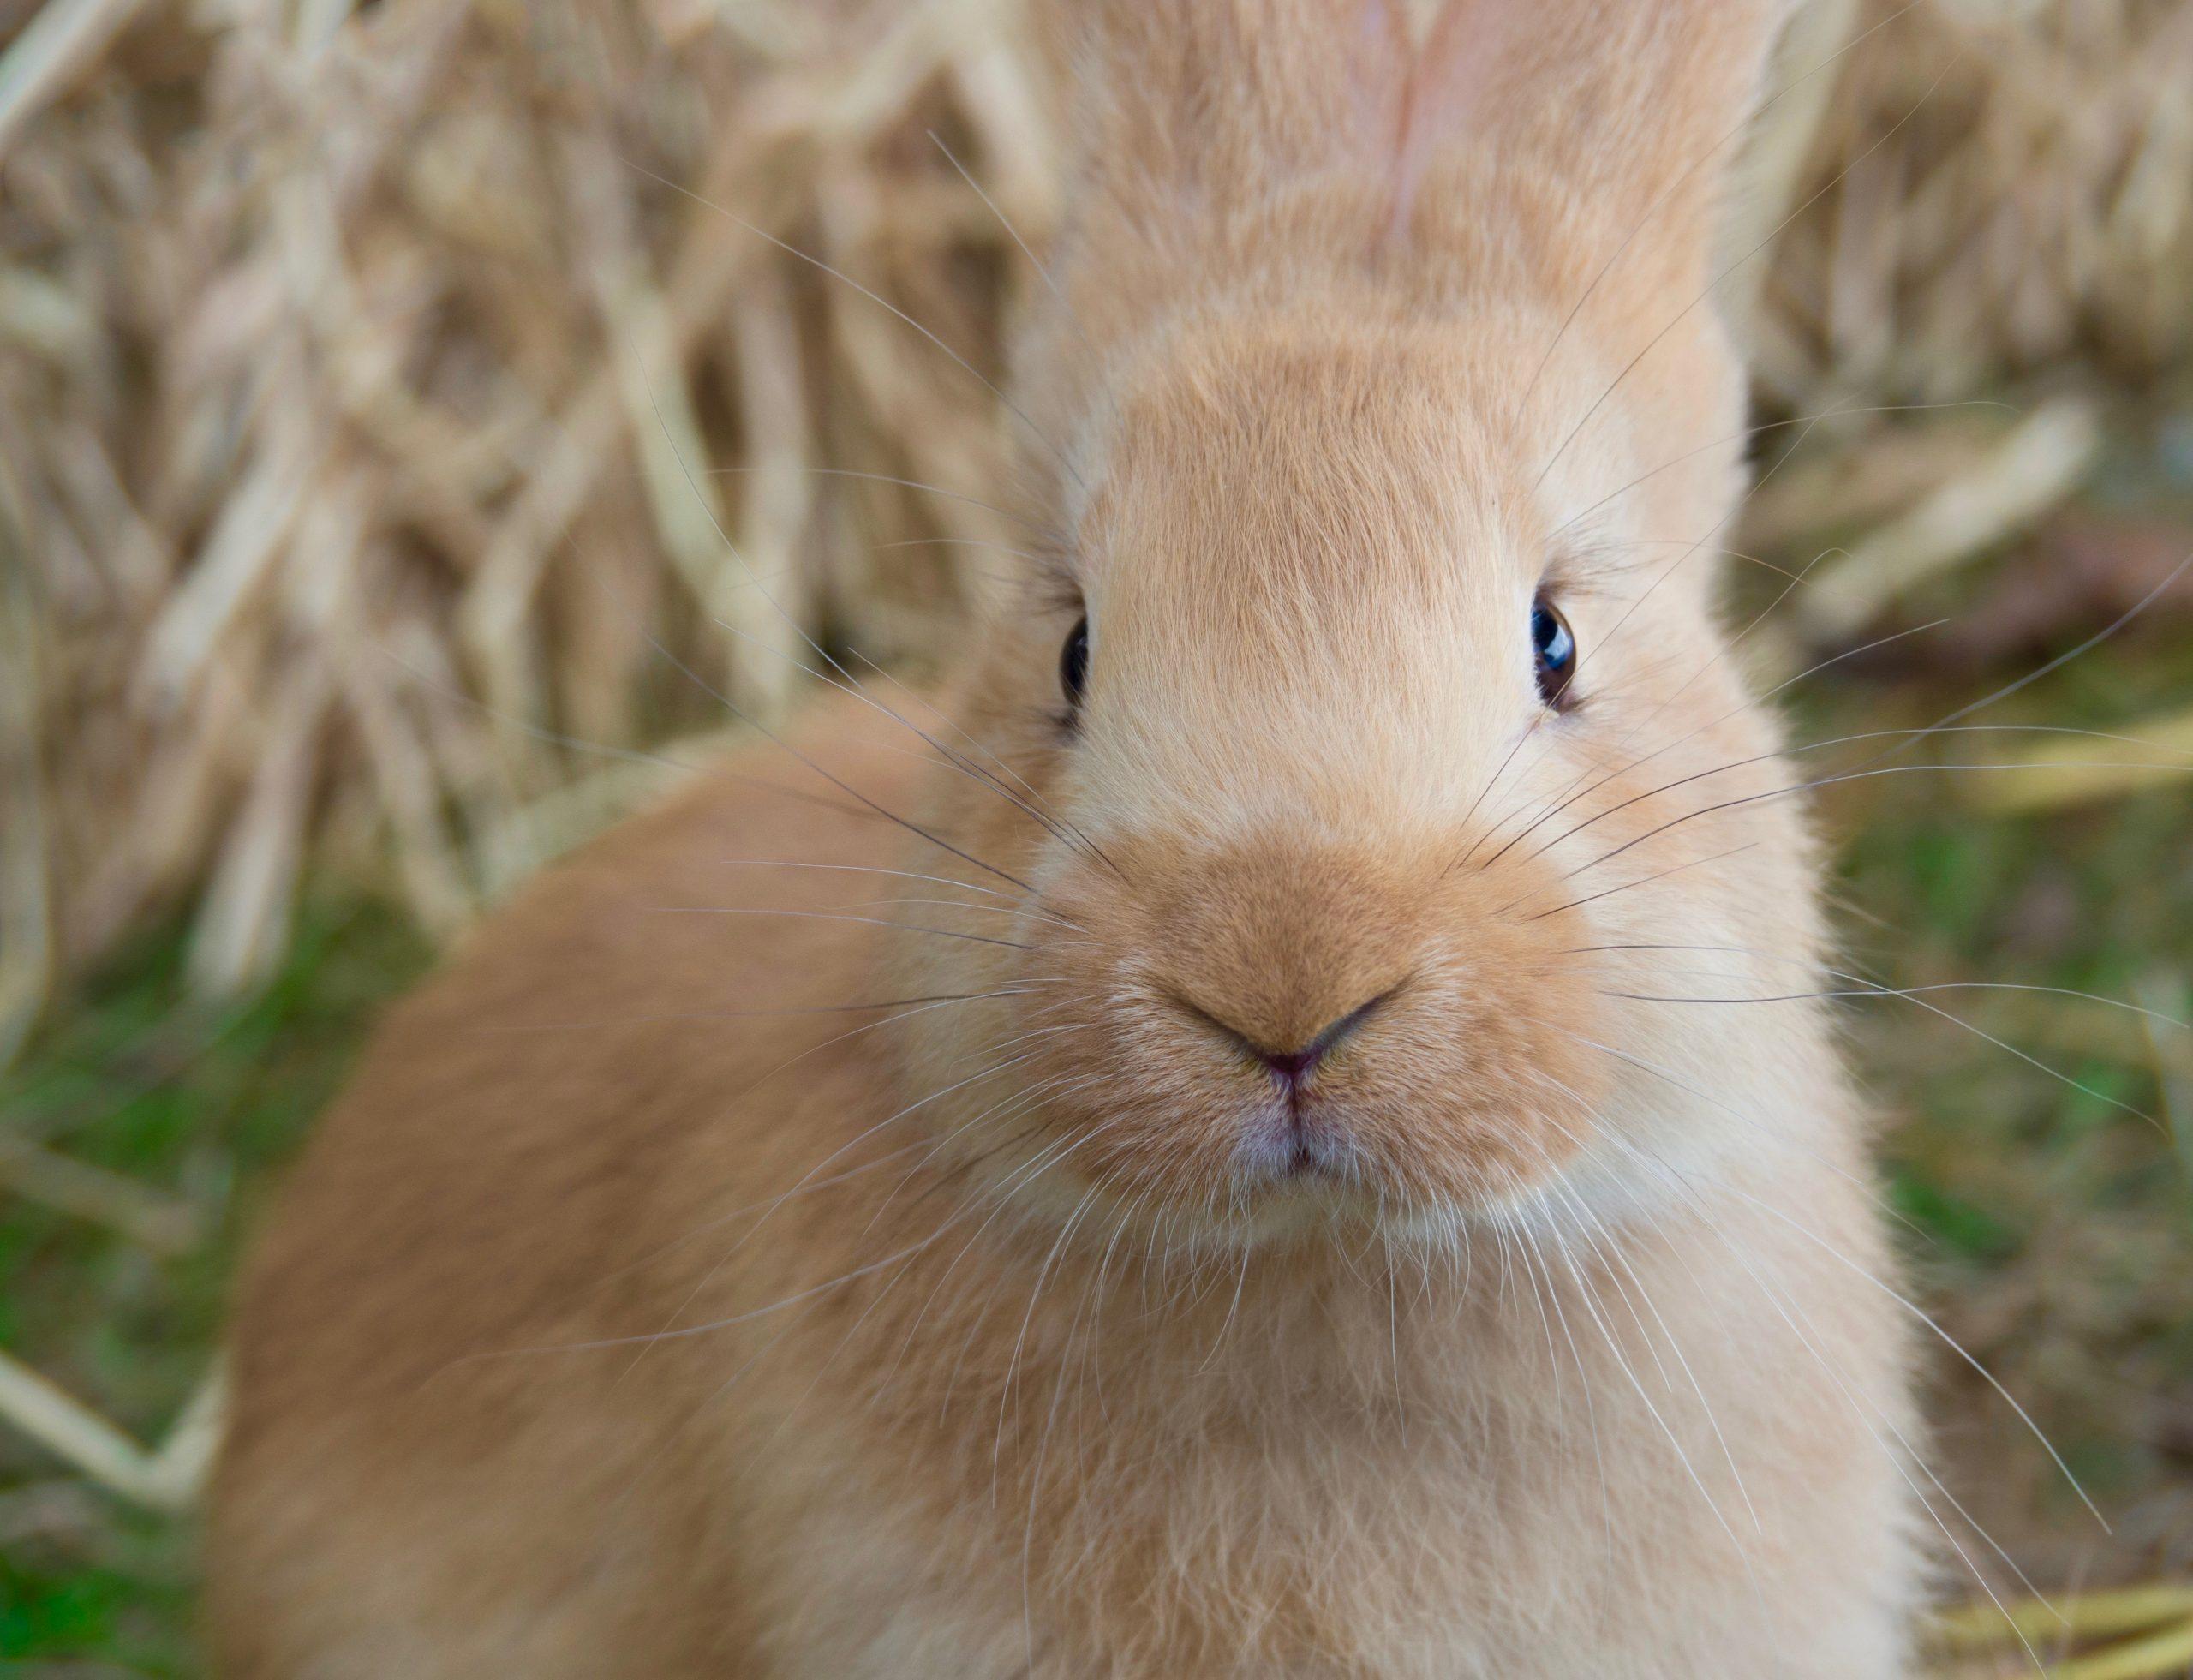 Portrait of Baby Flemish Giant Rabbit